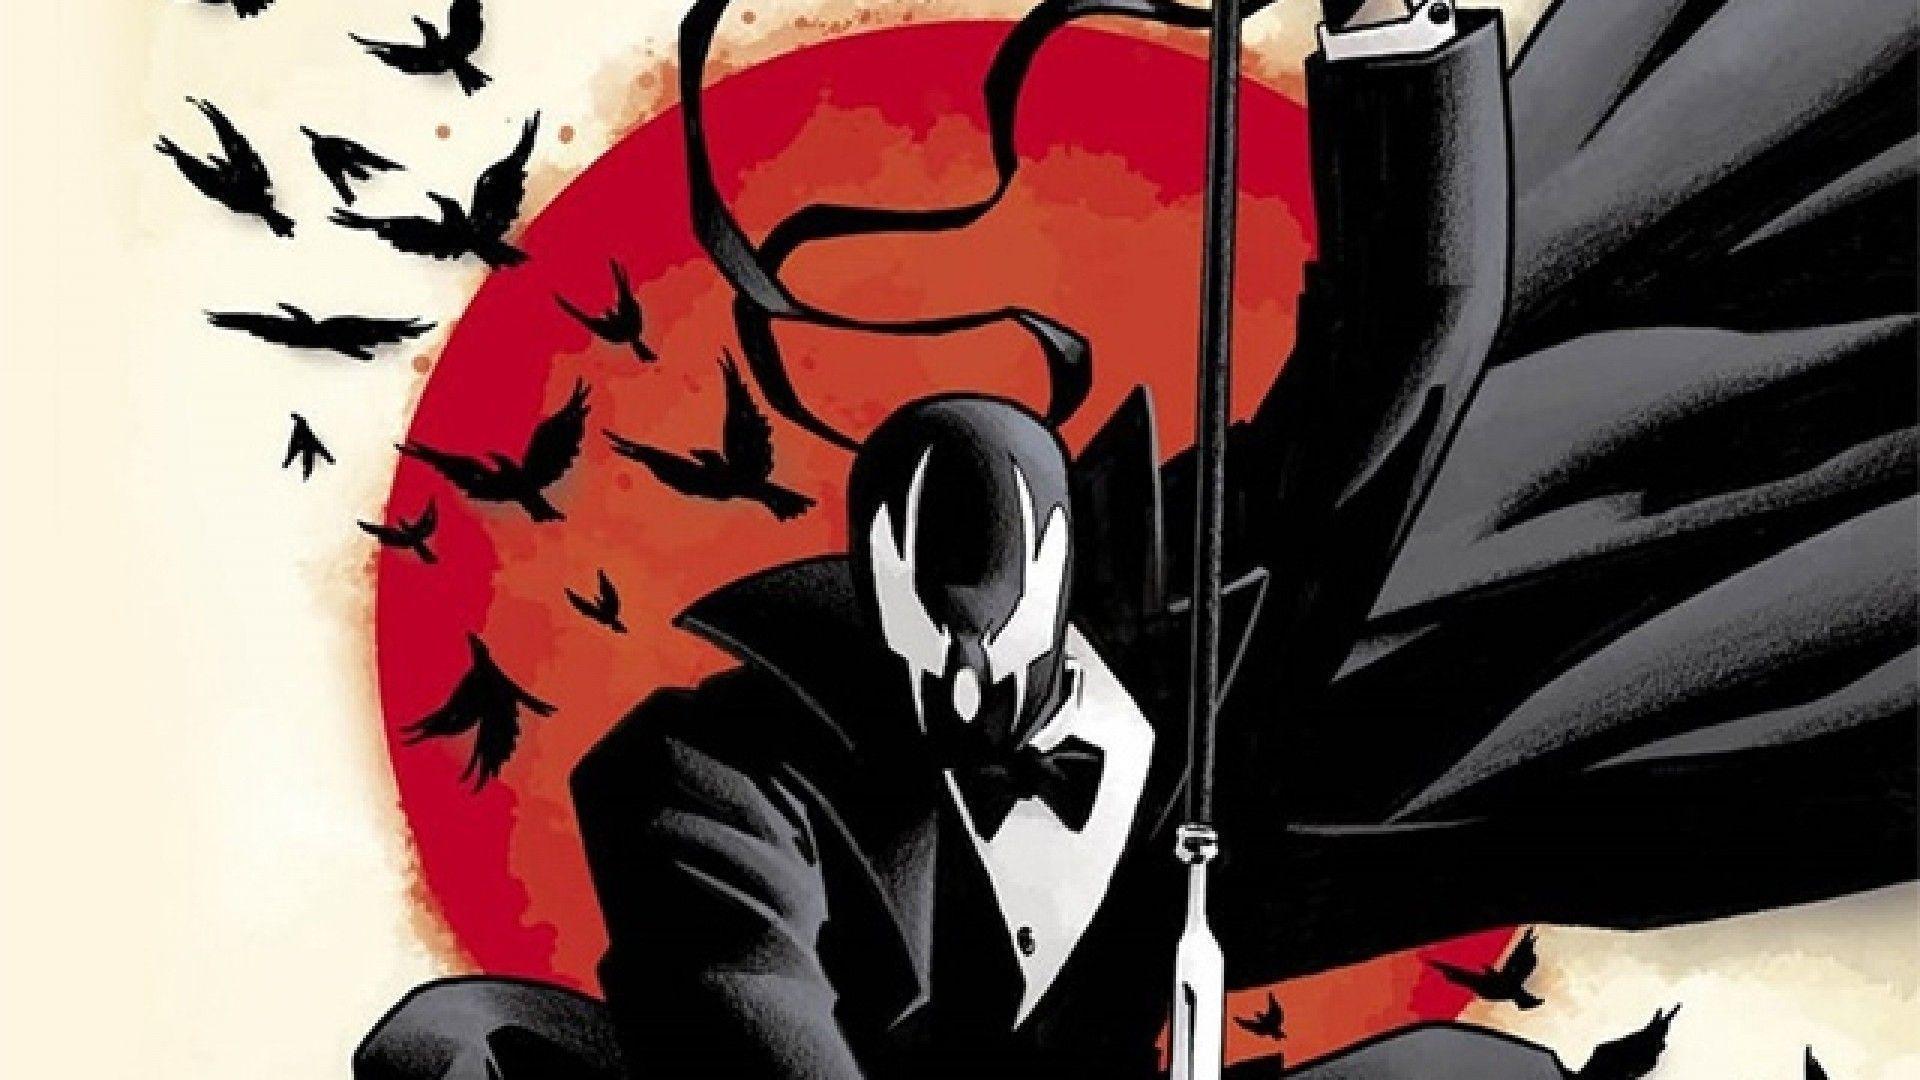 Deadpool Artwork Hd Iphone Wallpaper Movie Tv Themes 640x1136PX ...